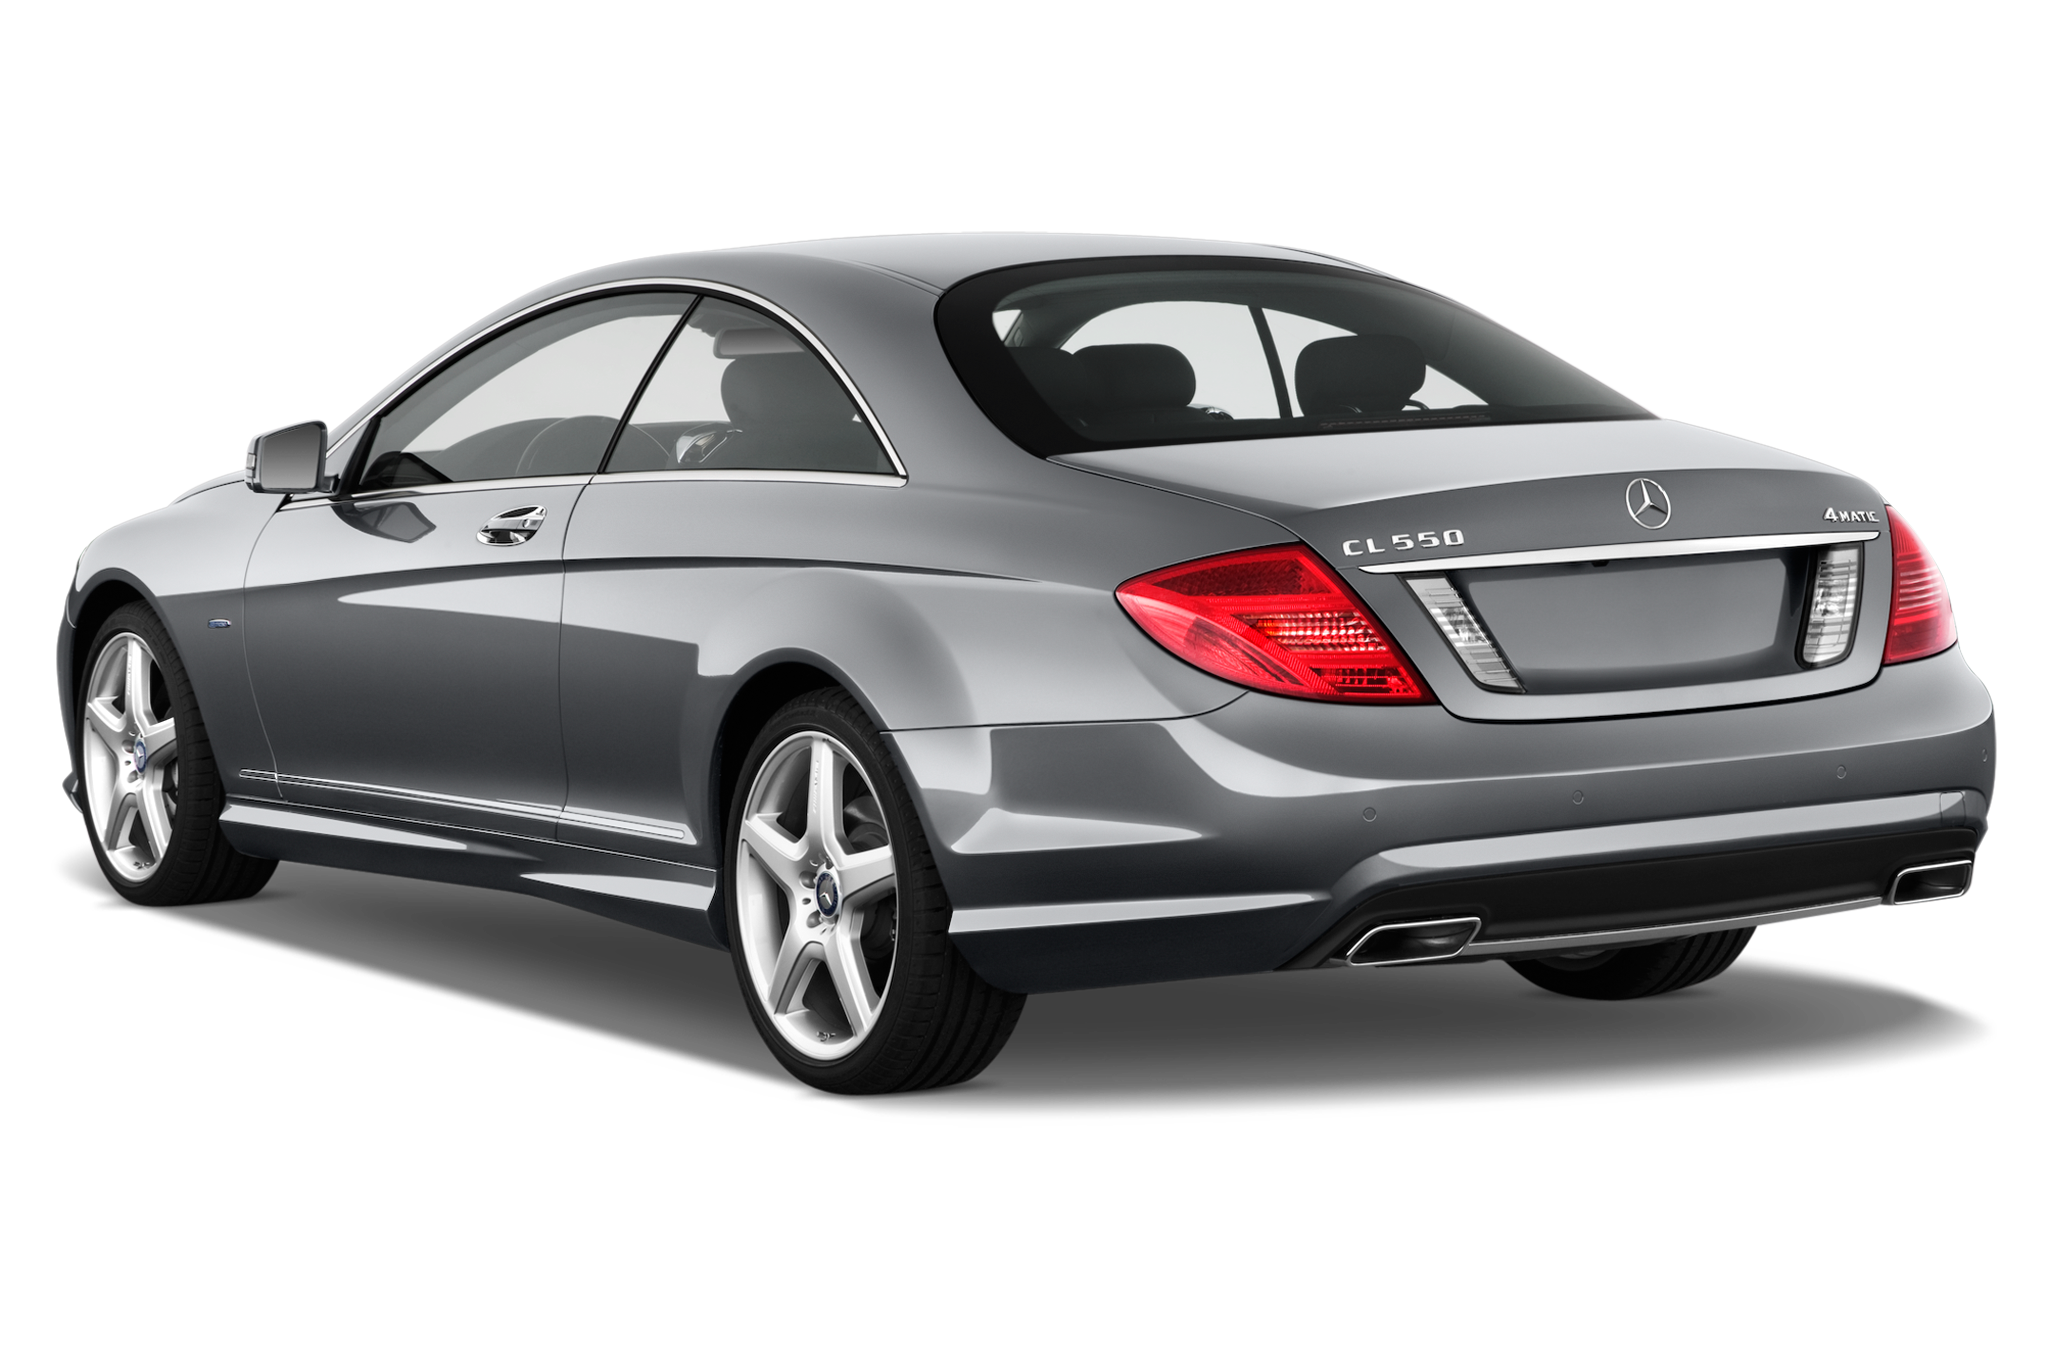 2012 mercedes benz cl550 4matic editors 39 notebook for Mercedes benz coupe 2012